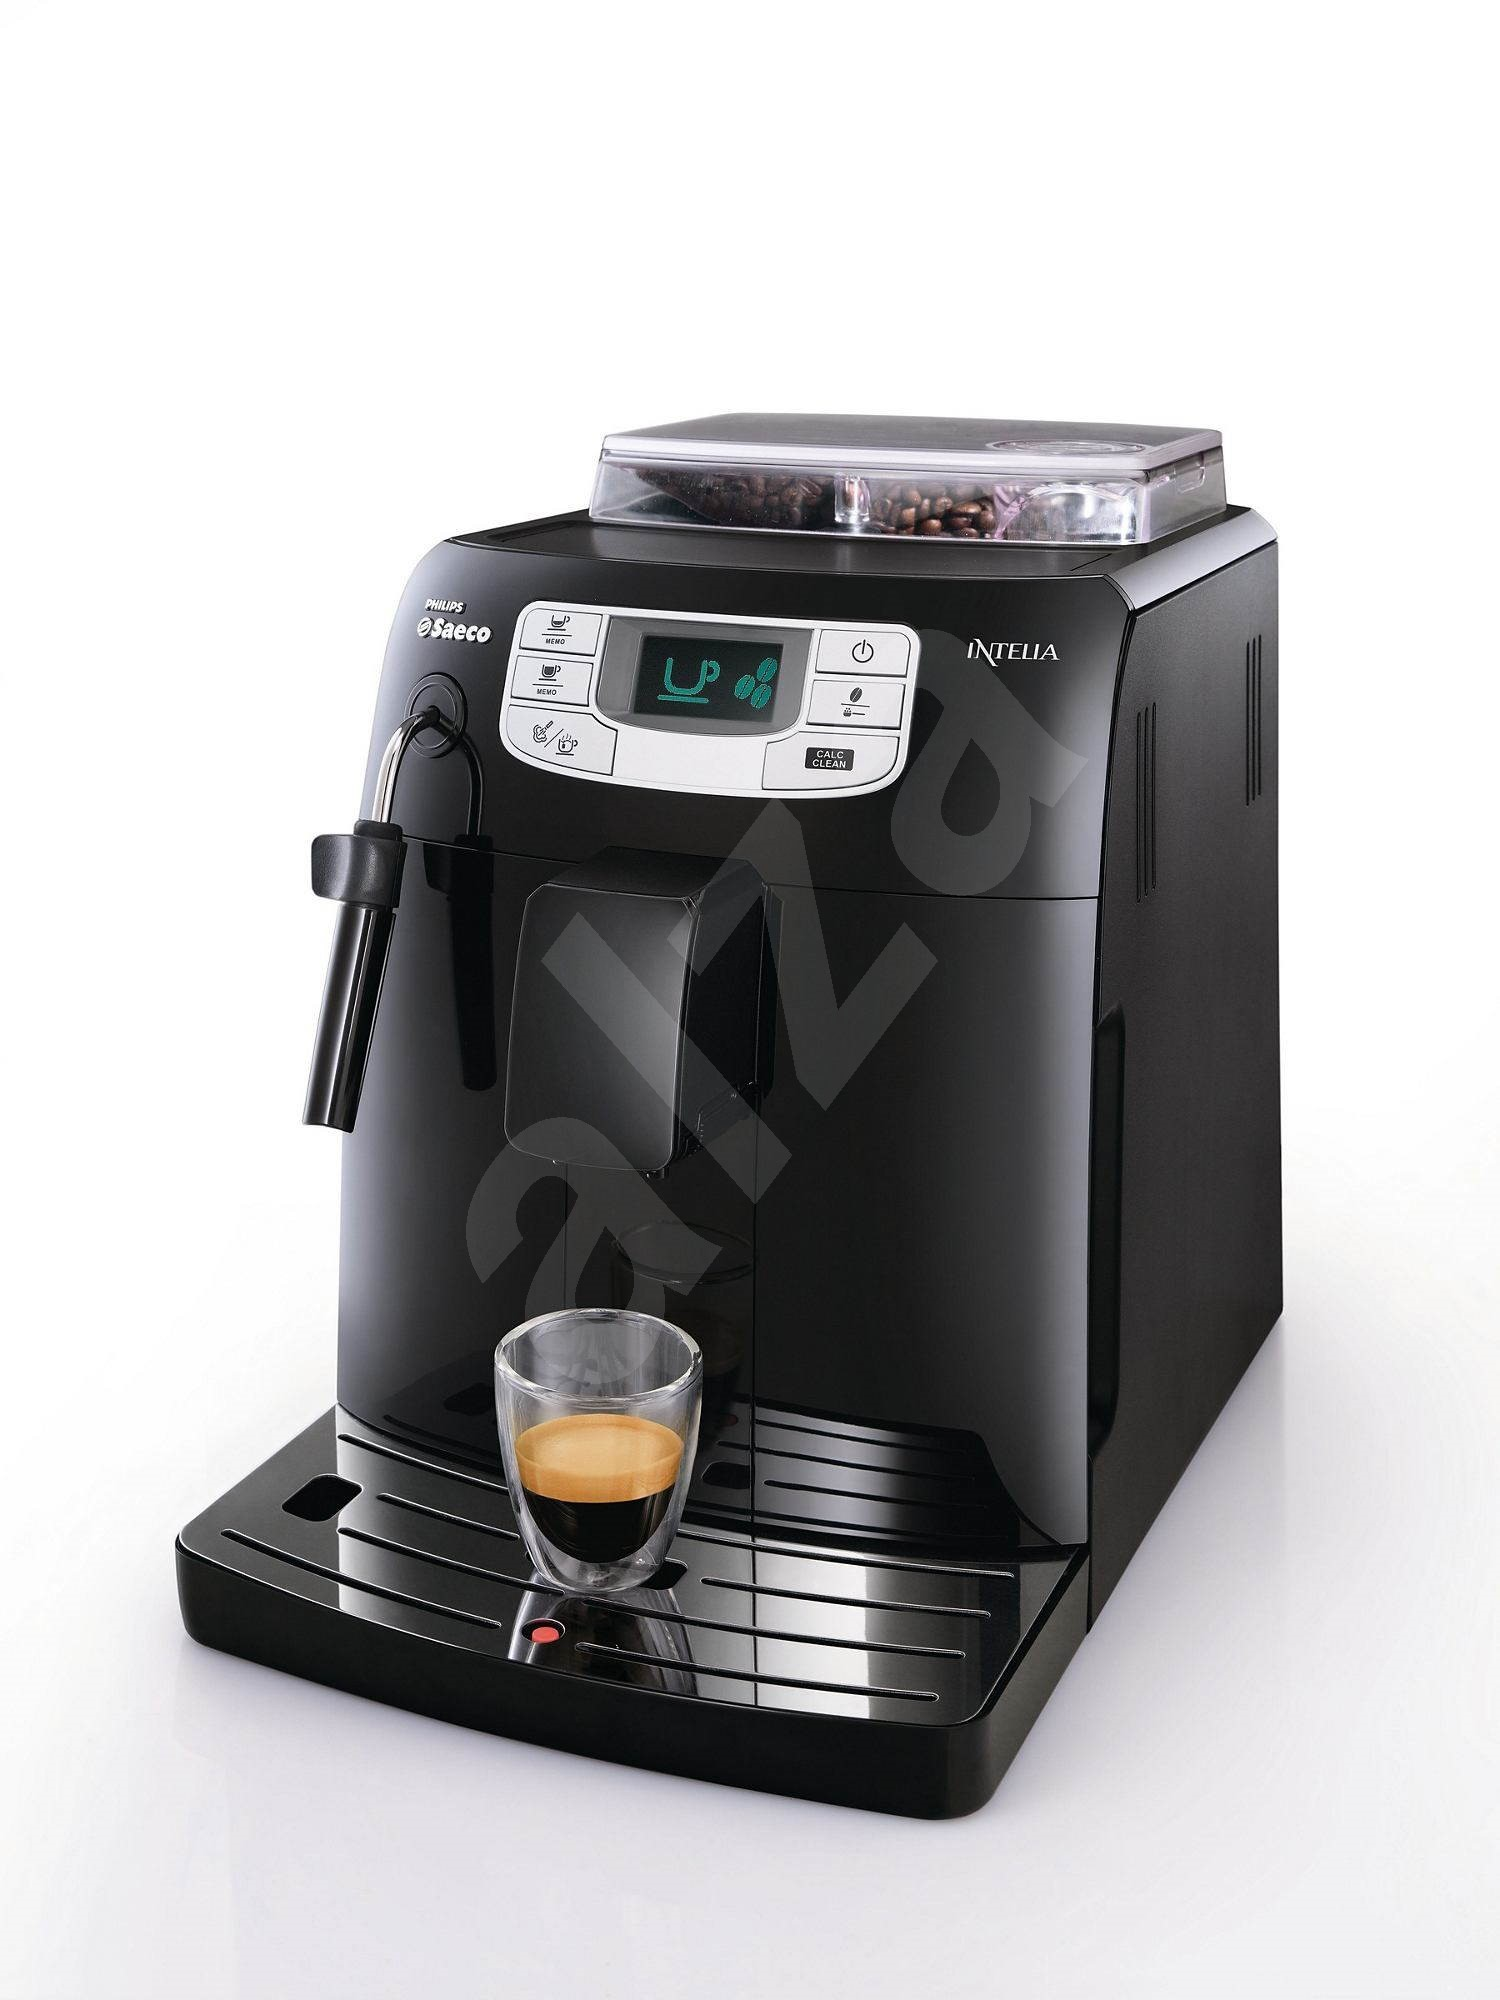 Philips SAECO HD8751/19 Intelia - Espresso Machine Alzashop.com